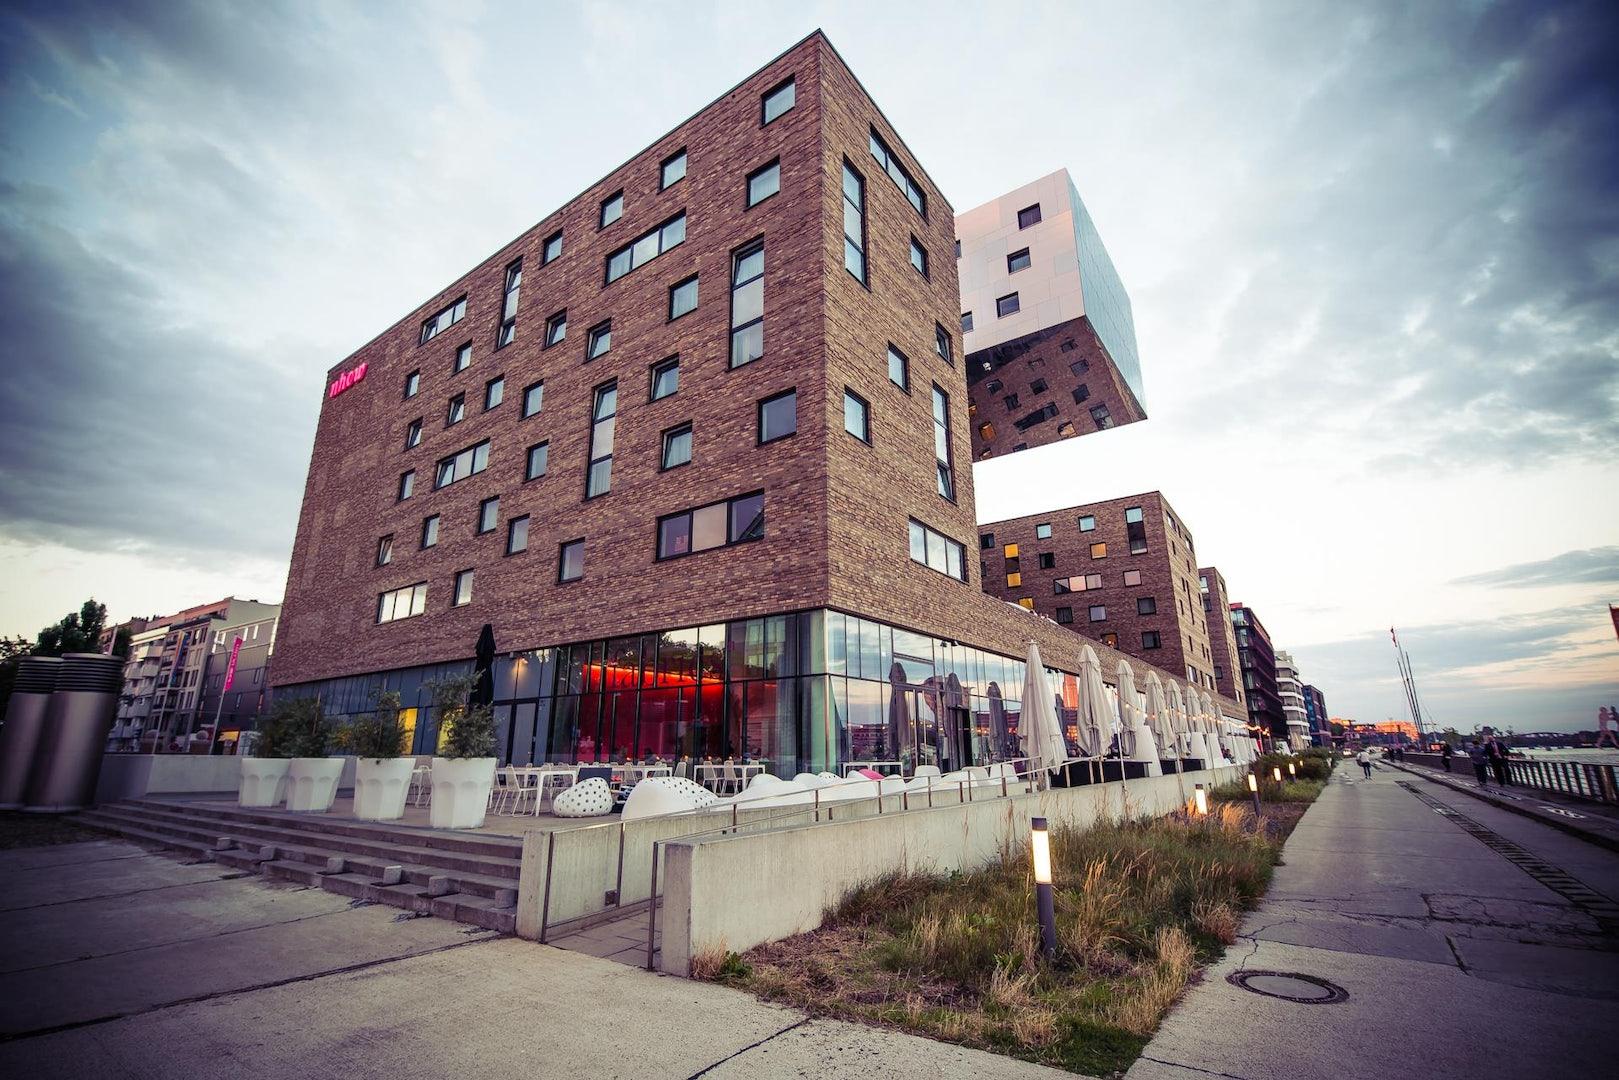 Berlin - Nhow hotel